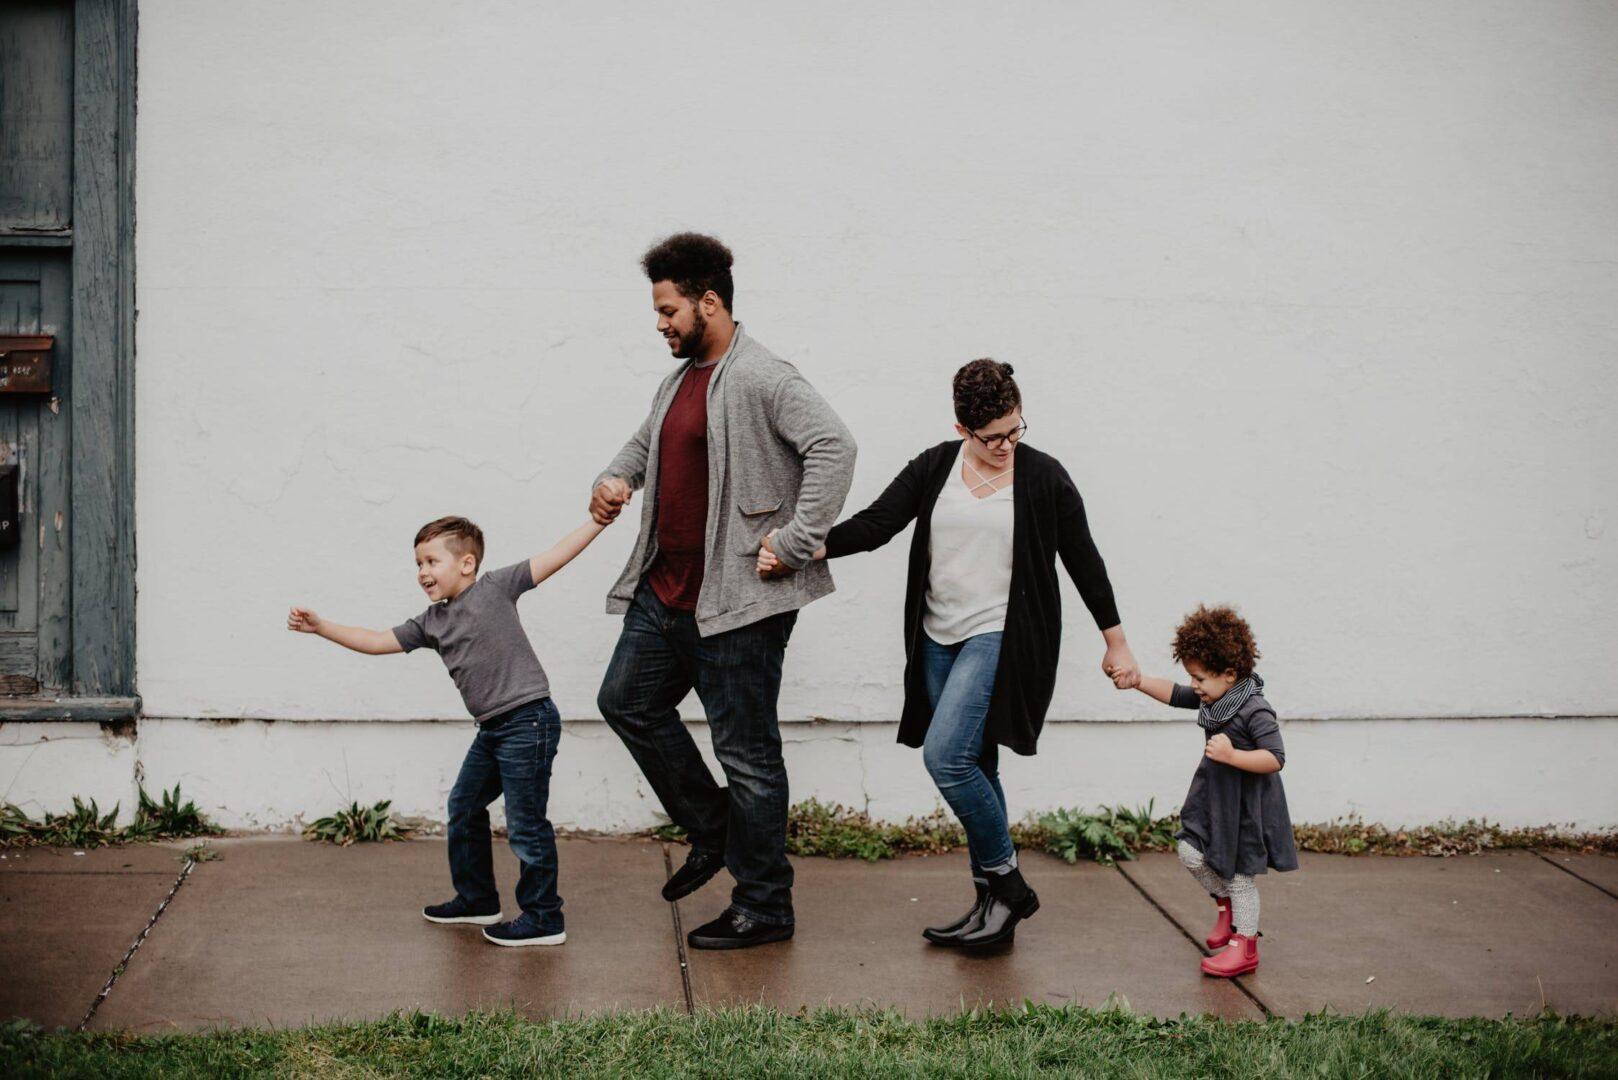 Targeting Multi-generational Households